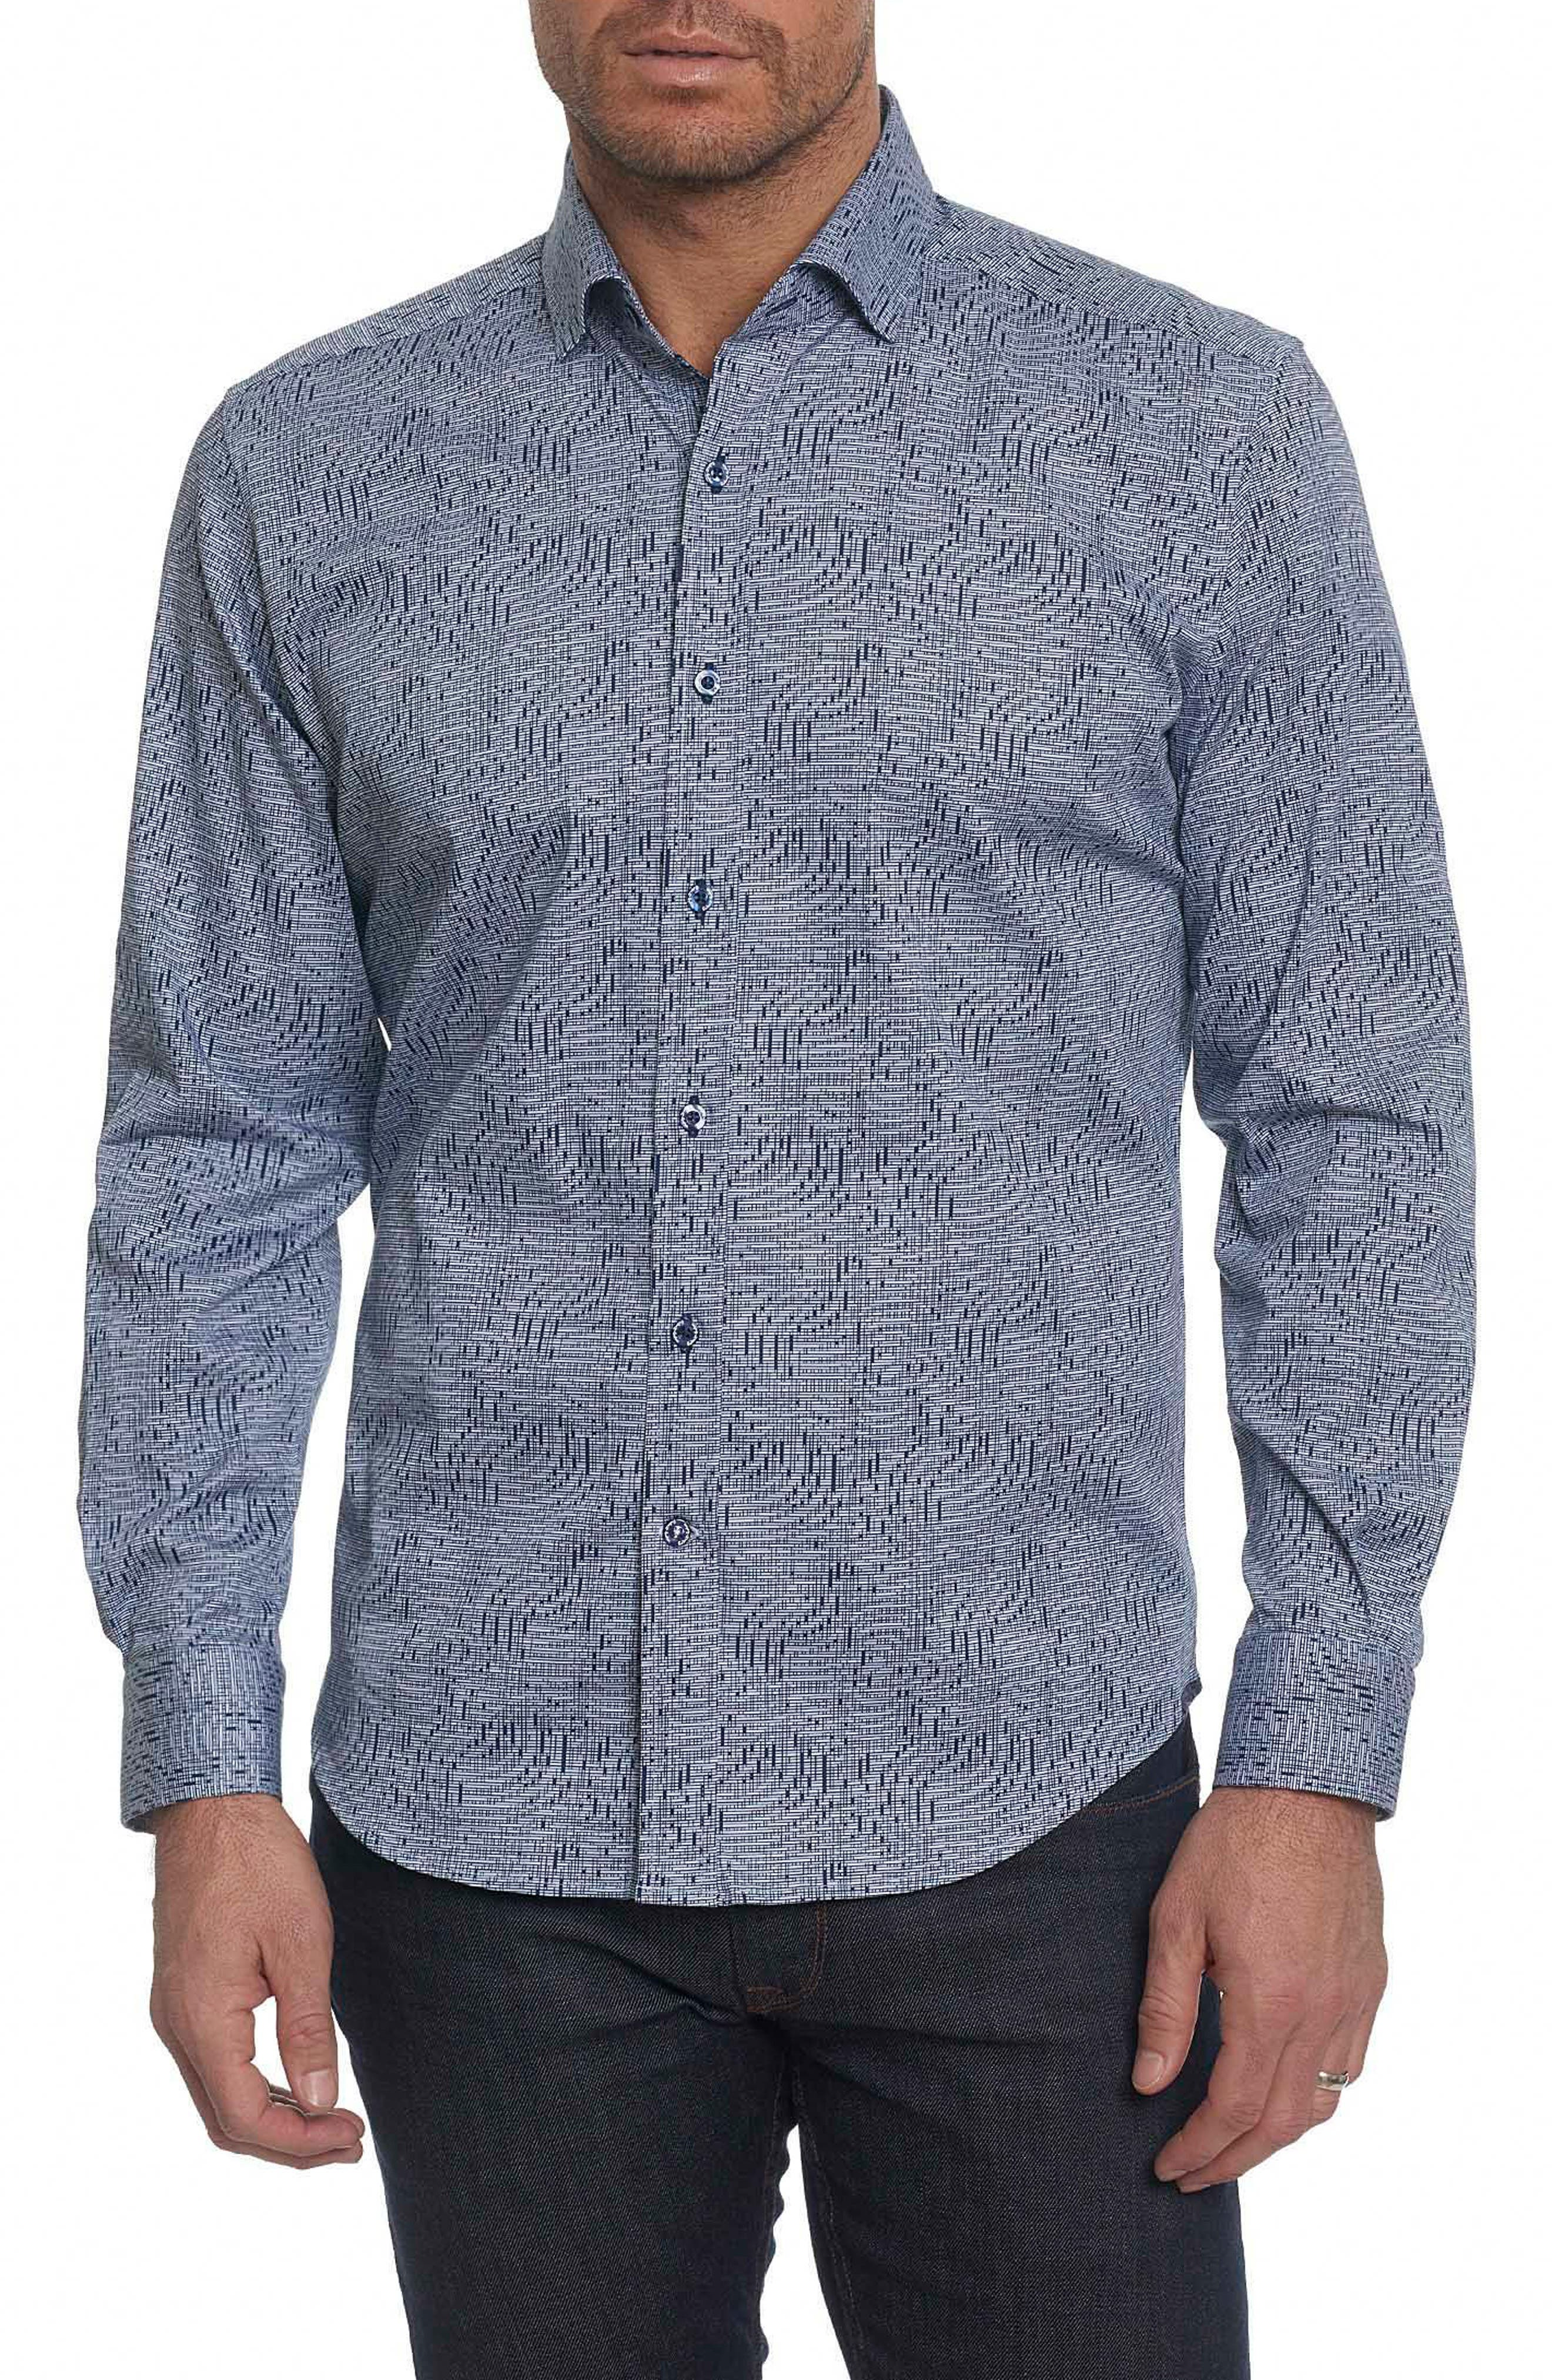 Donovan Tailored Fit Sport Shirt,                             Main thumbnail 1, color,                             410